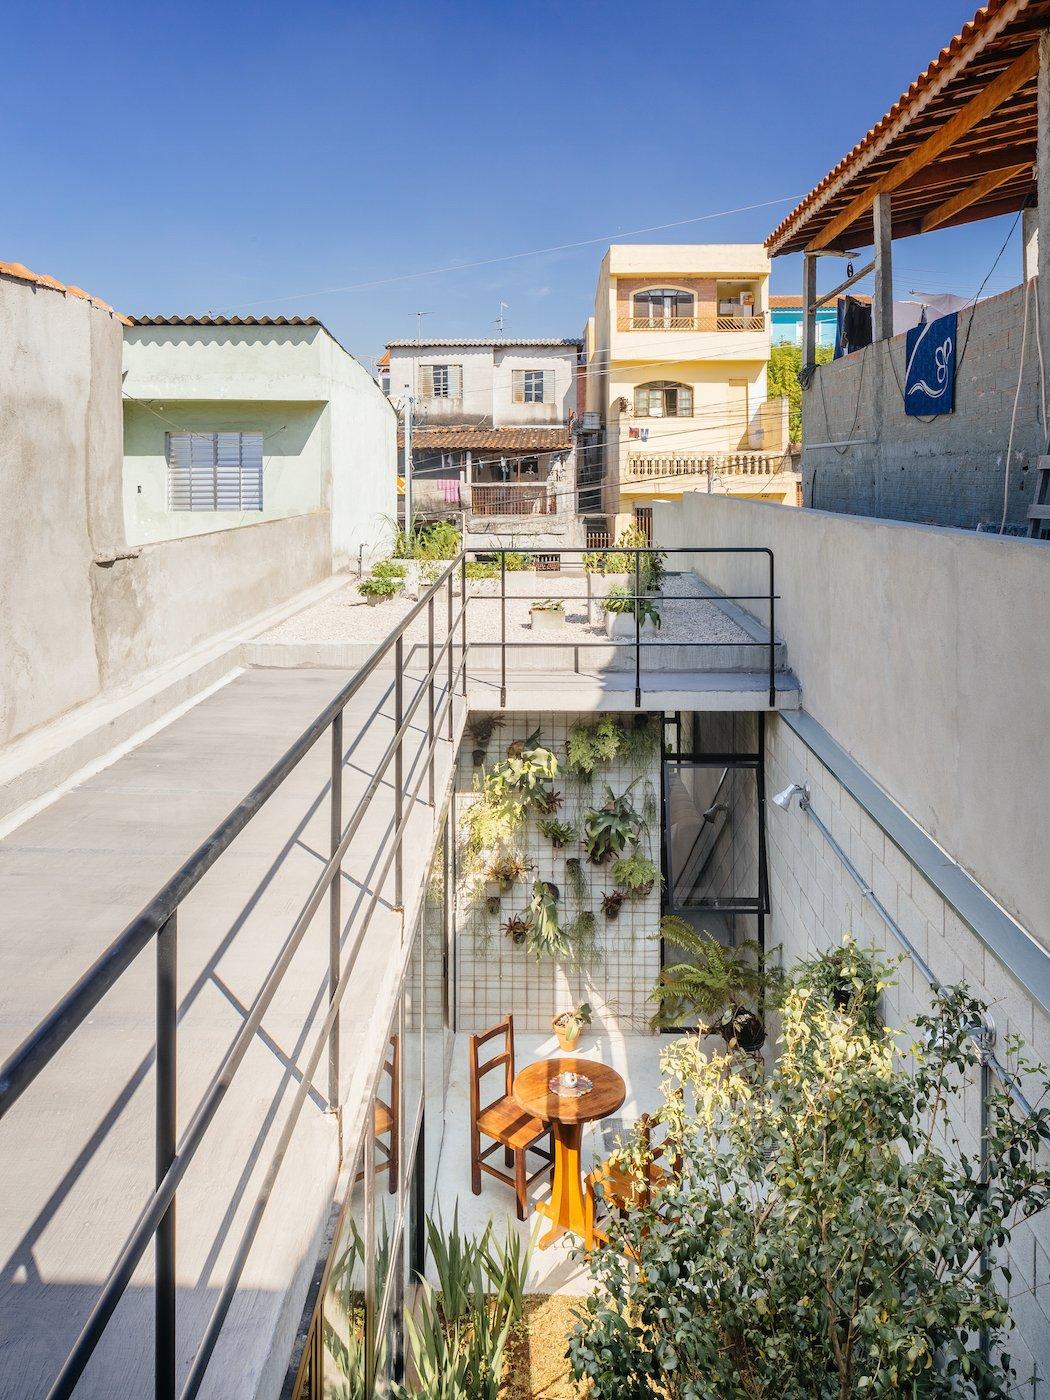 A narrow concrete home in s o paulo - The narrow house of sao paolo ...